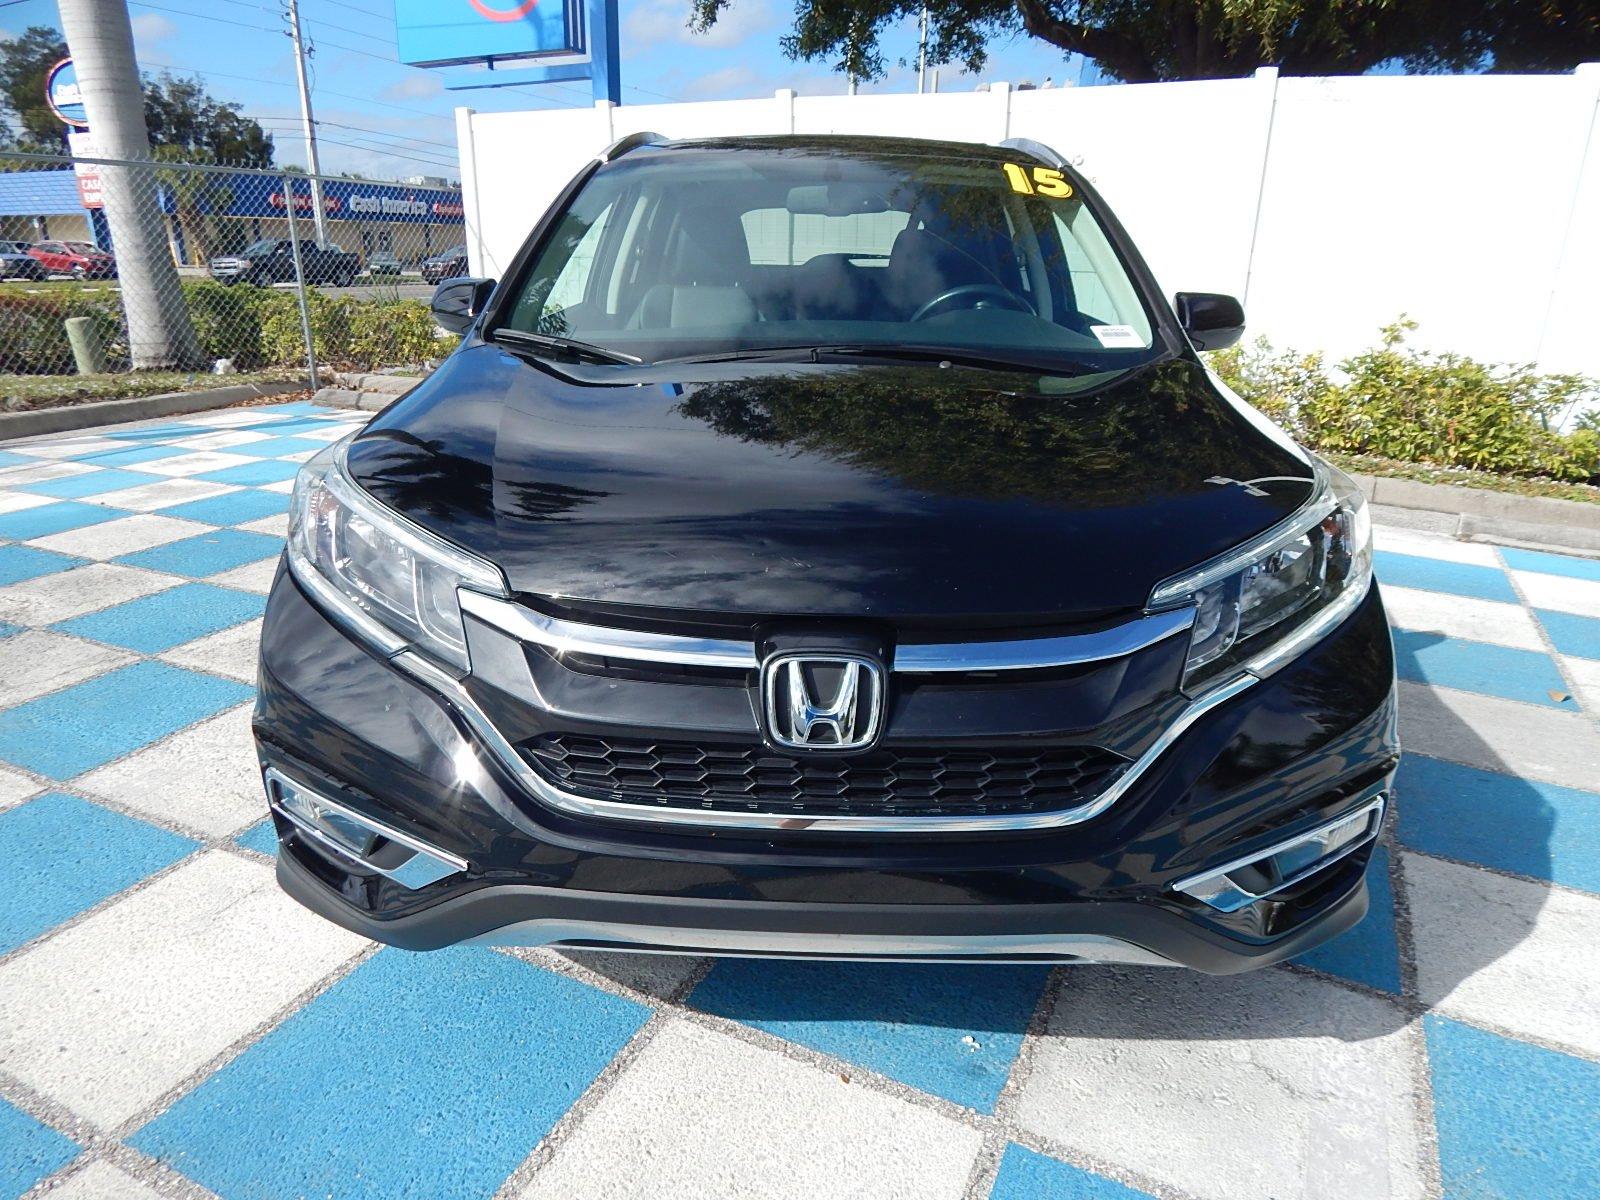 Certified Pre-Owned 2015 Honda CR-V EX-L